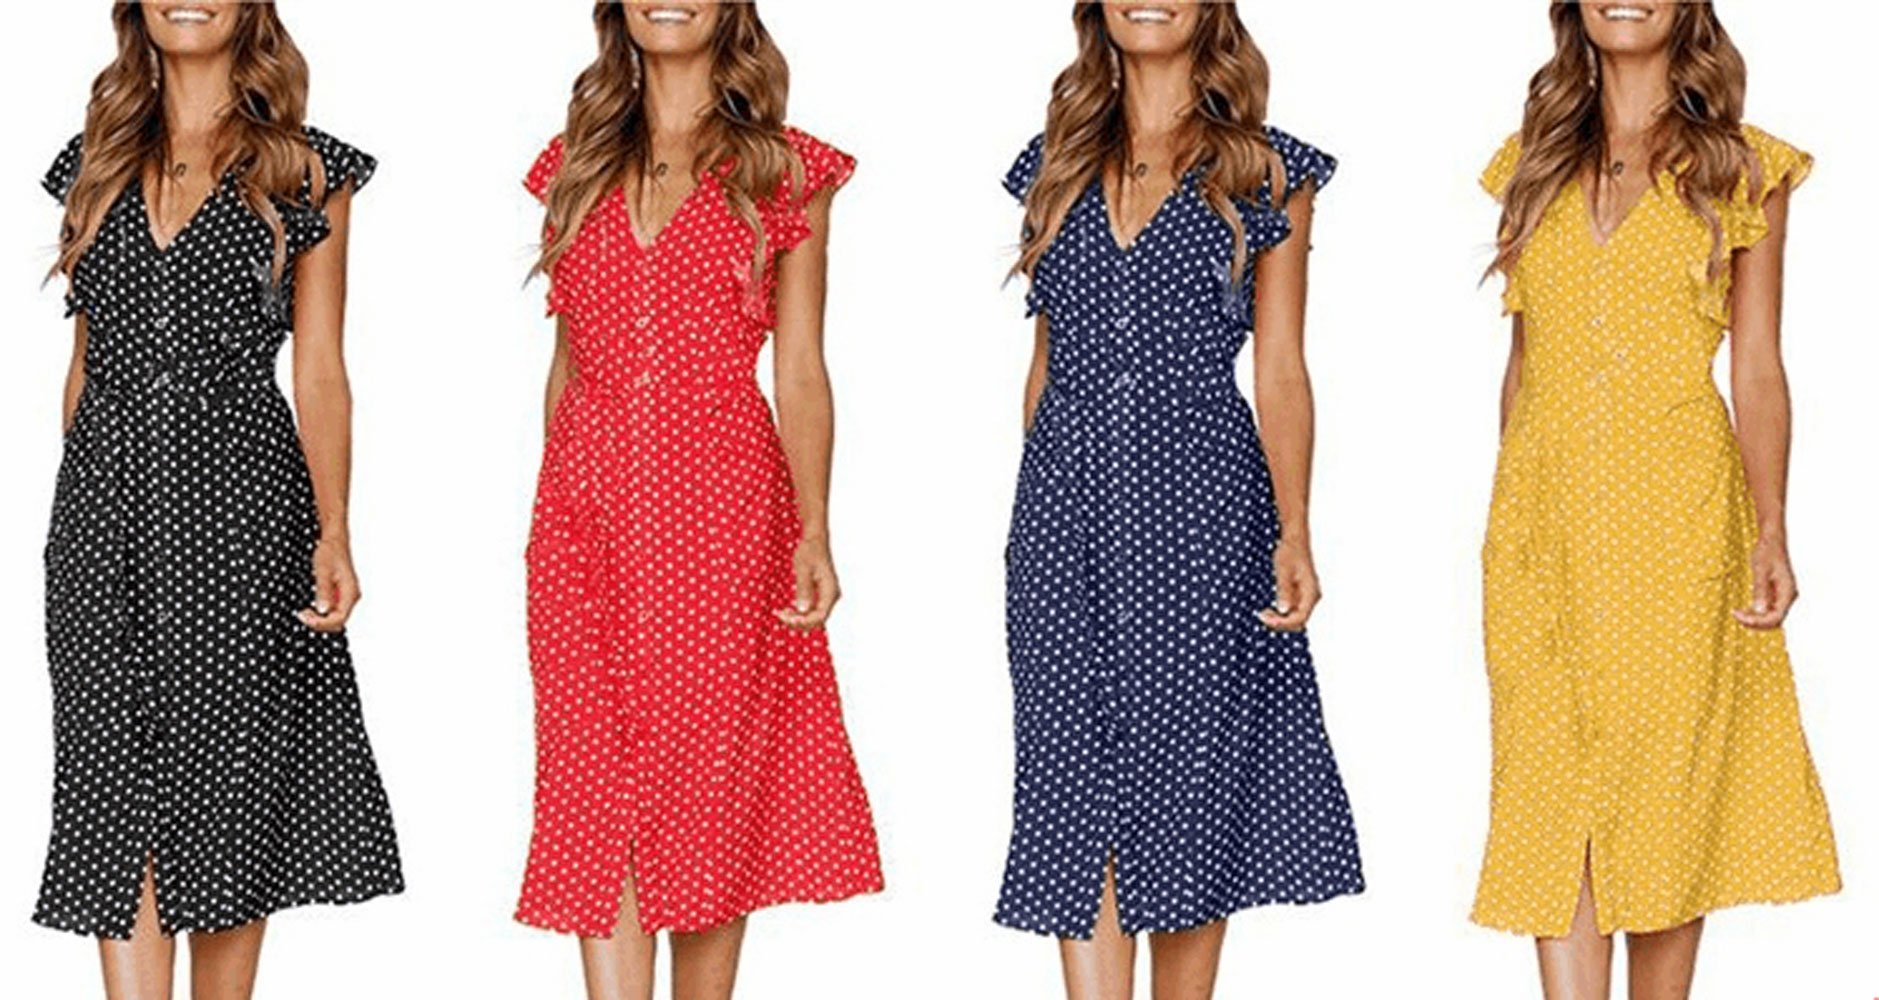 Pevor Women\'s Summer Casual Dress V Neck Polka Dots Ruffle Short Sleeve Swing Midi Dress Black S